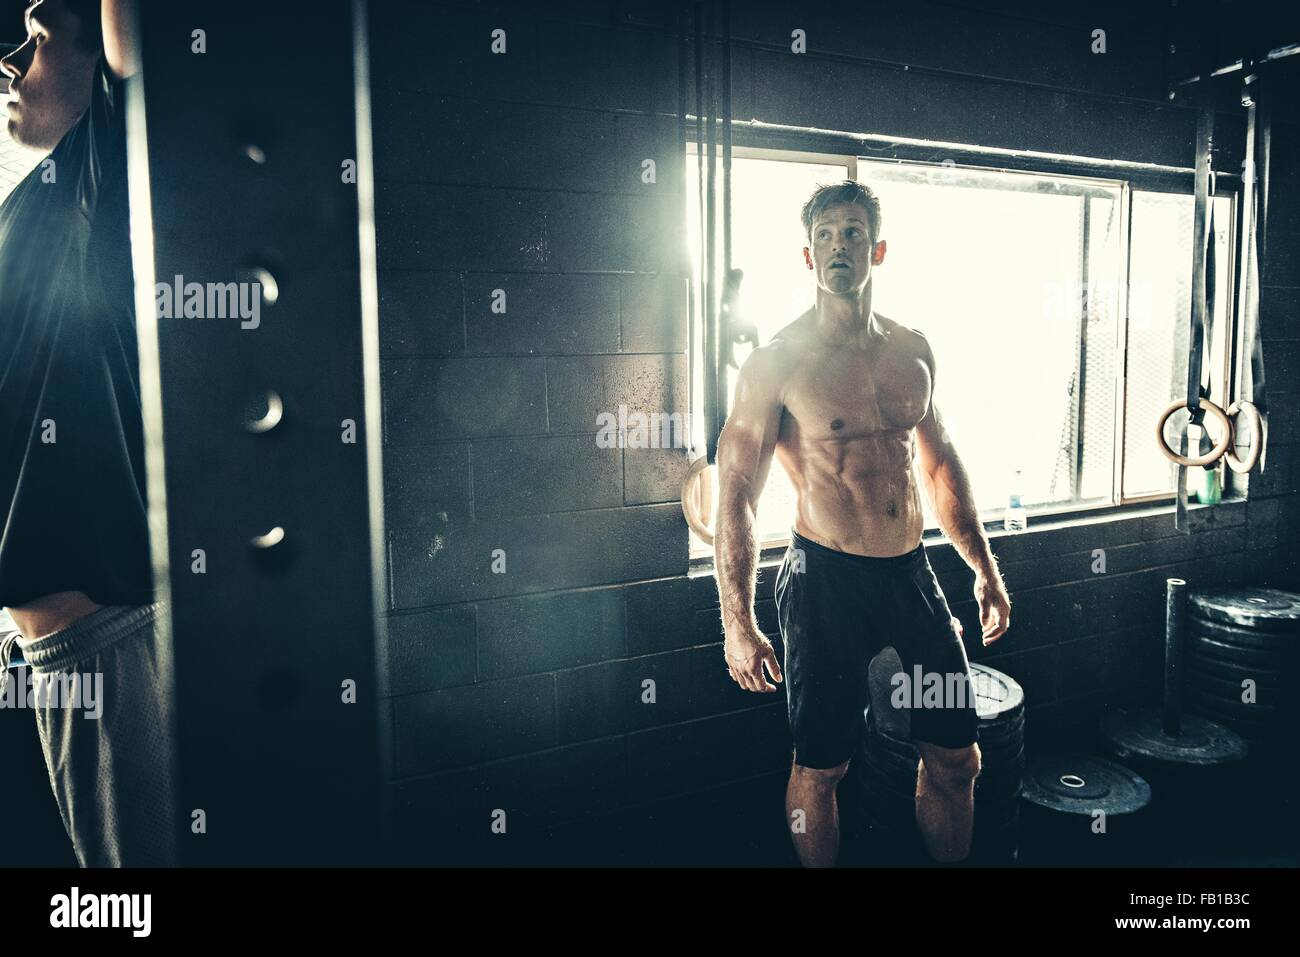 Men training in gym - Stock Image